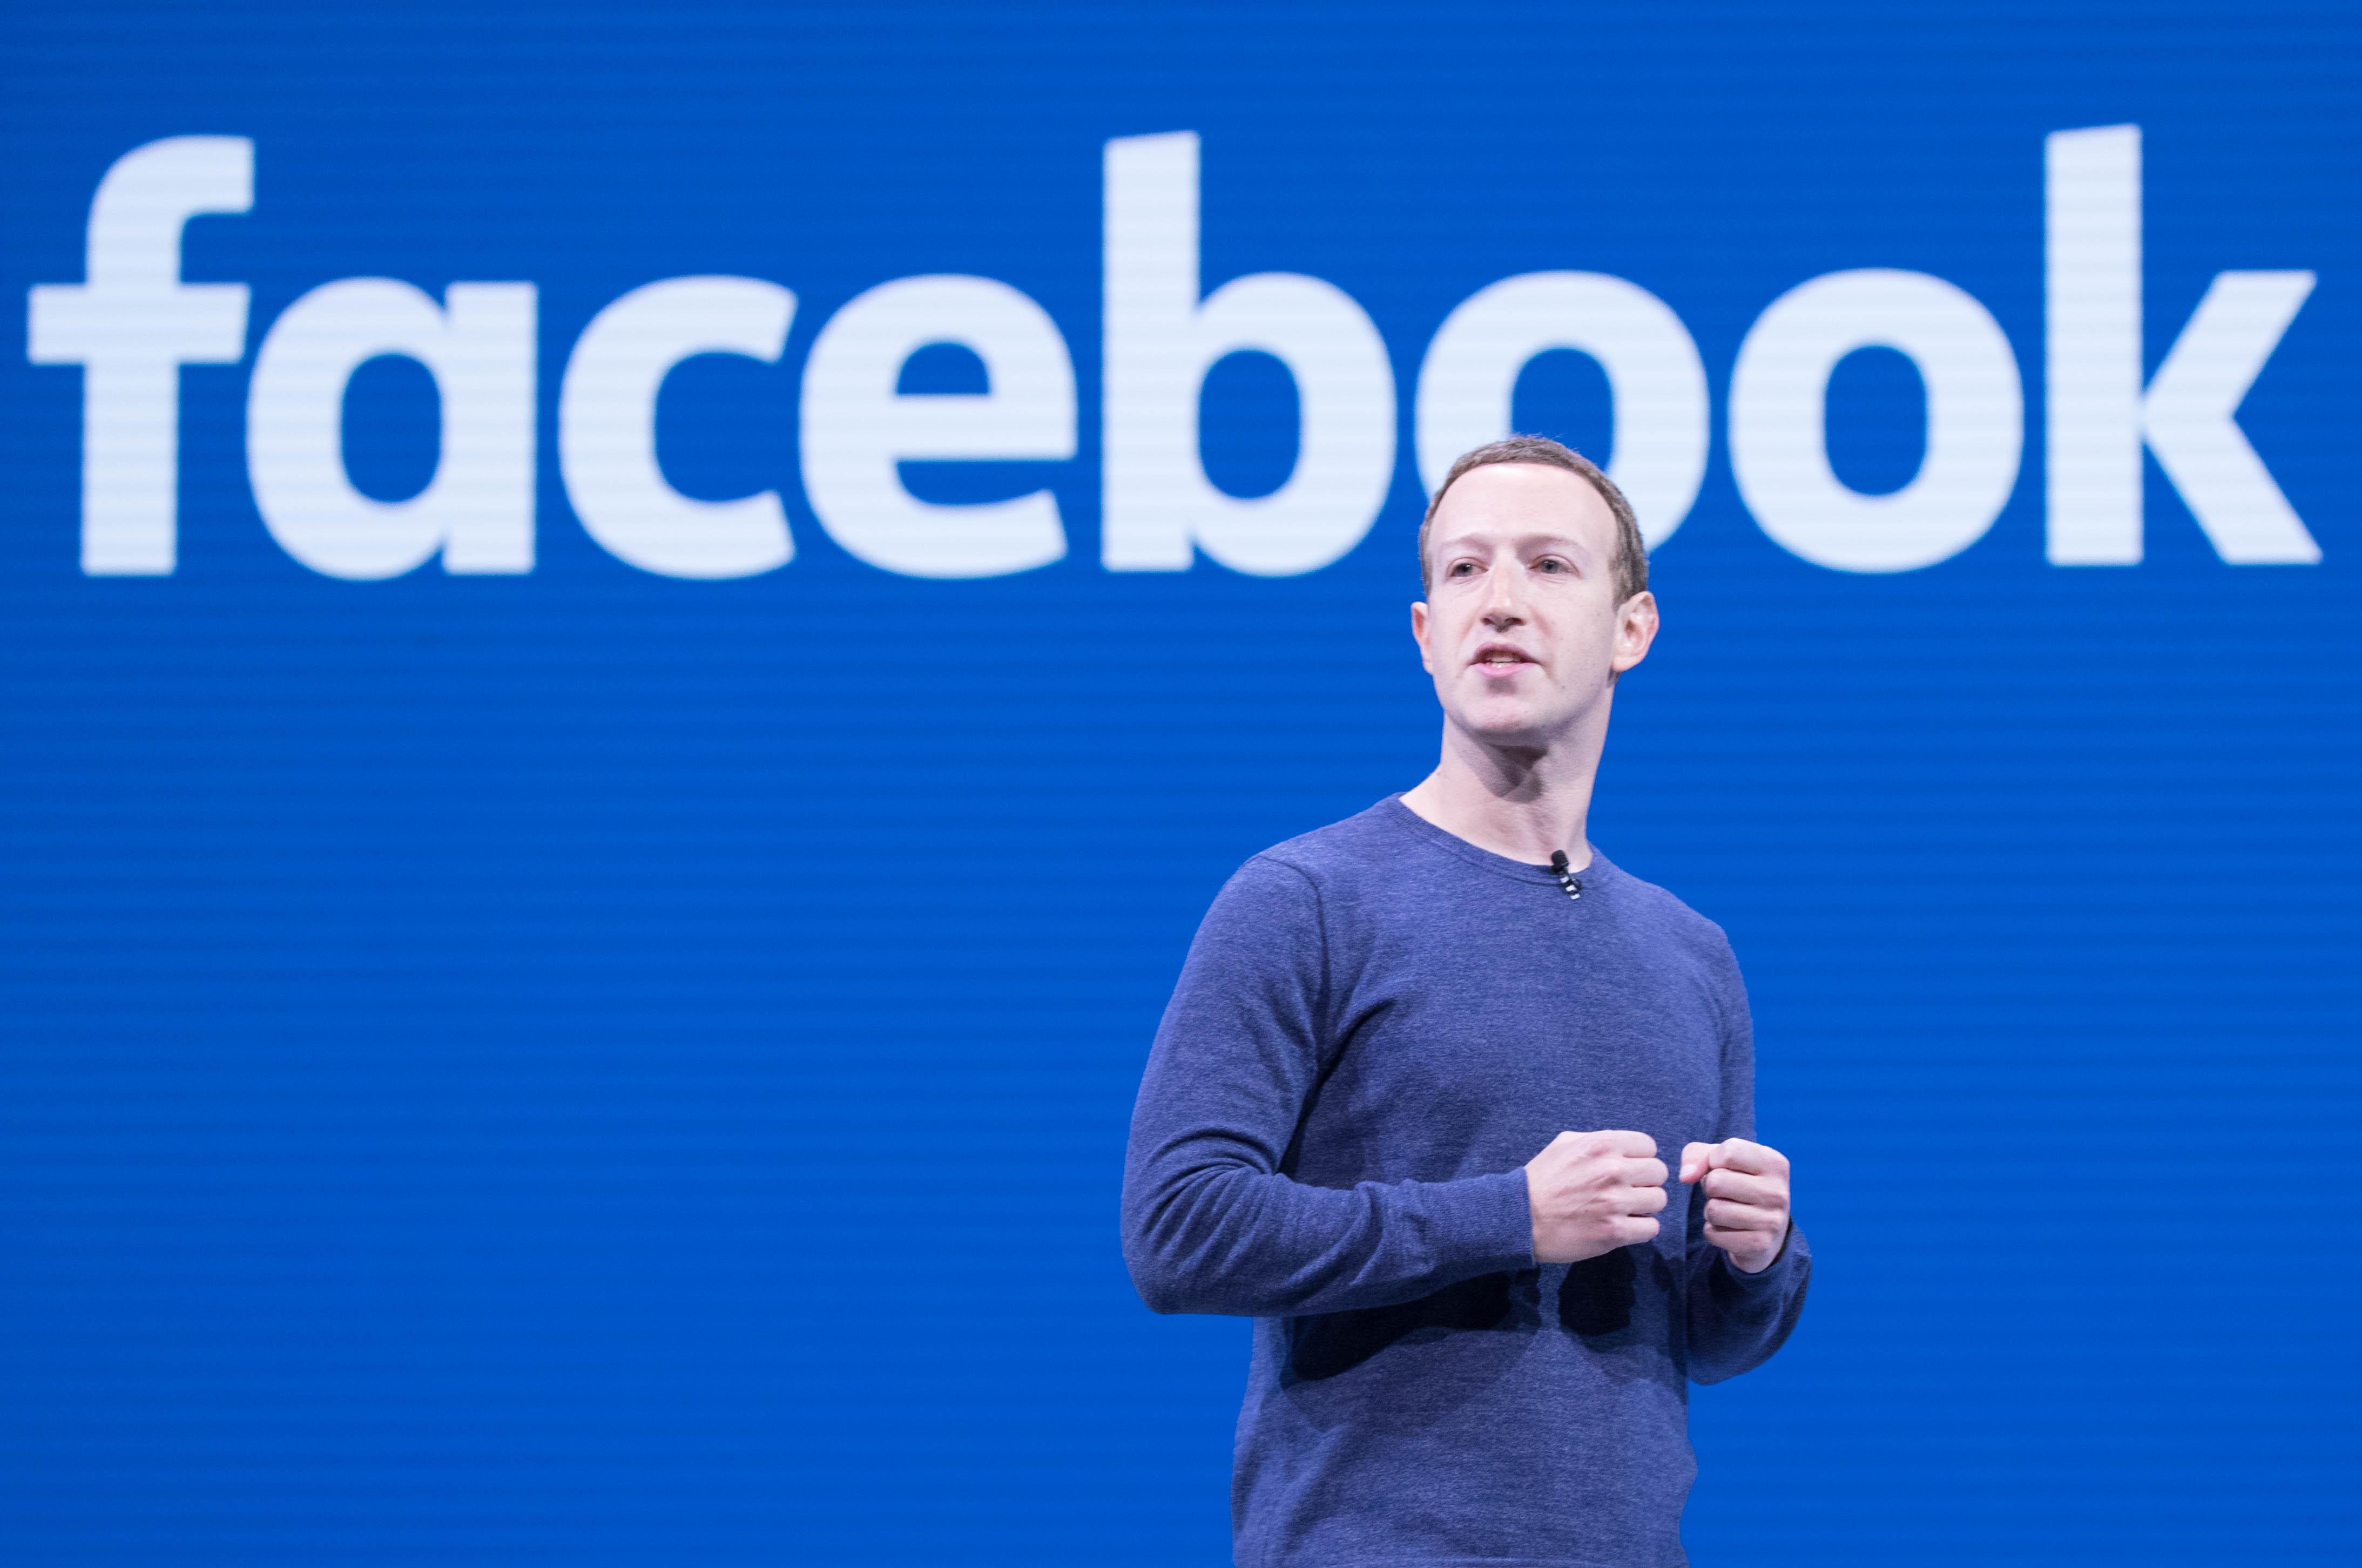 File:Mark Zuckerberg F8 2018 Keynote (41793468182).jpg - Wikimedia Commons